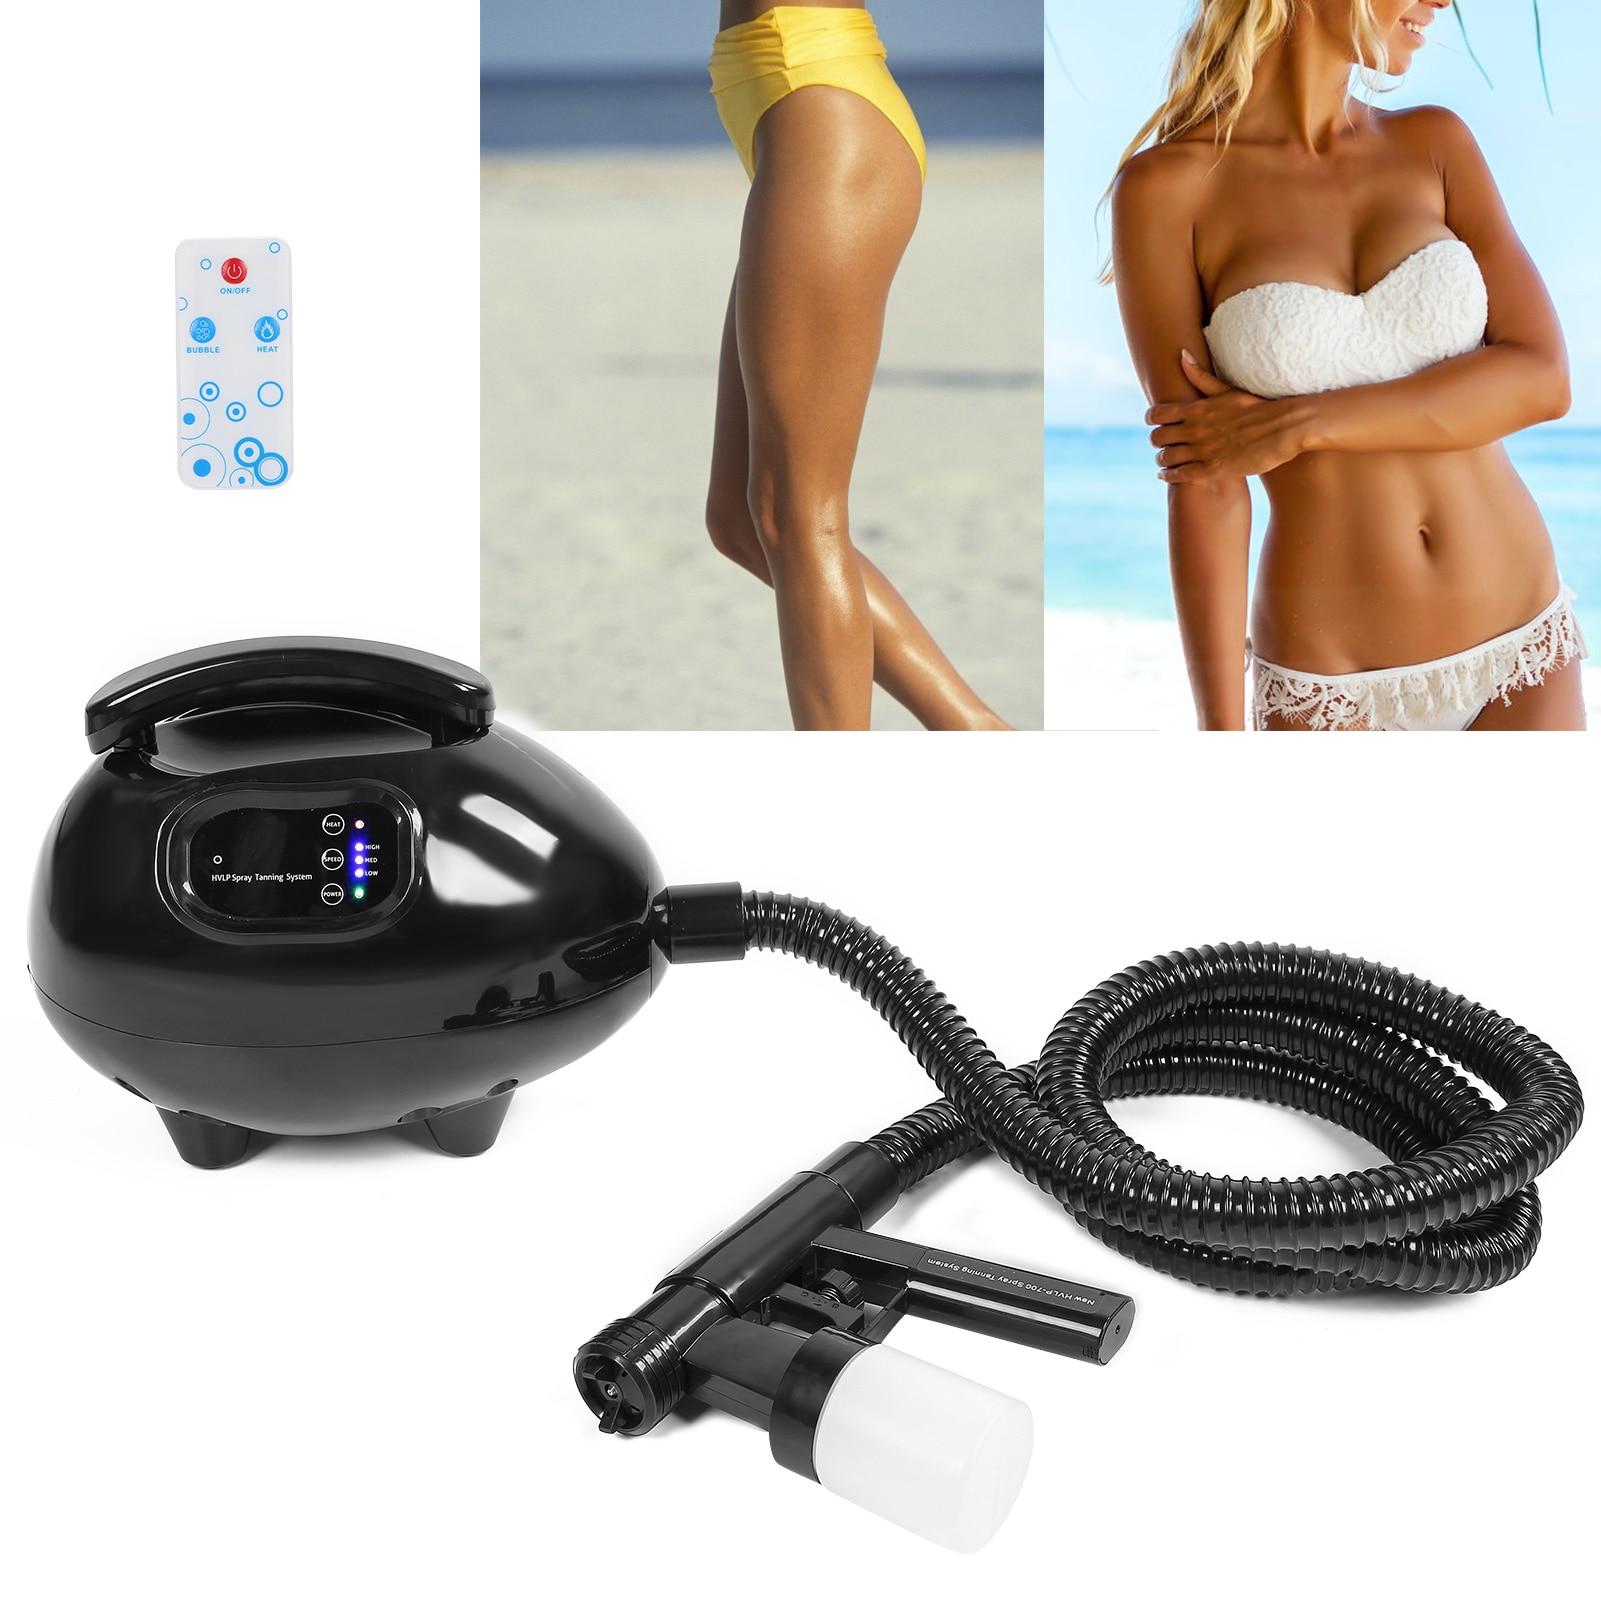 Bronze Tan Spray Machine Household Professional Electric Spray Tan Airbrush Machine